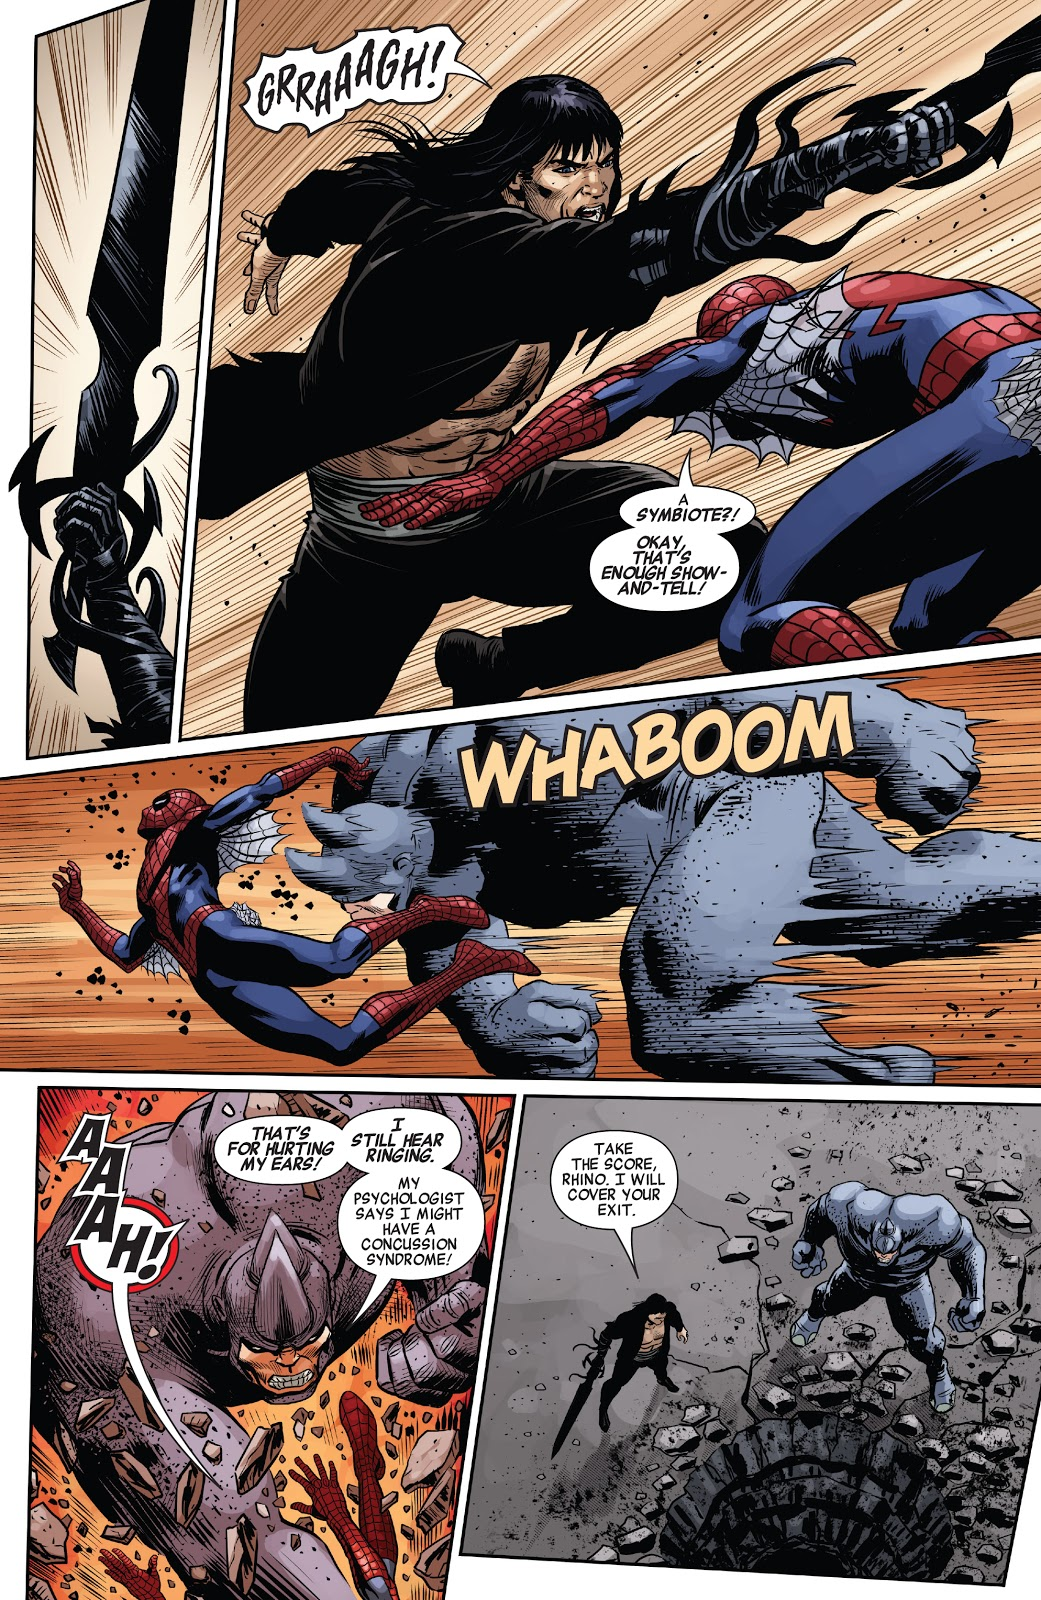 Spider-Man Meets Conan The Barbarian